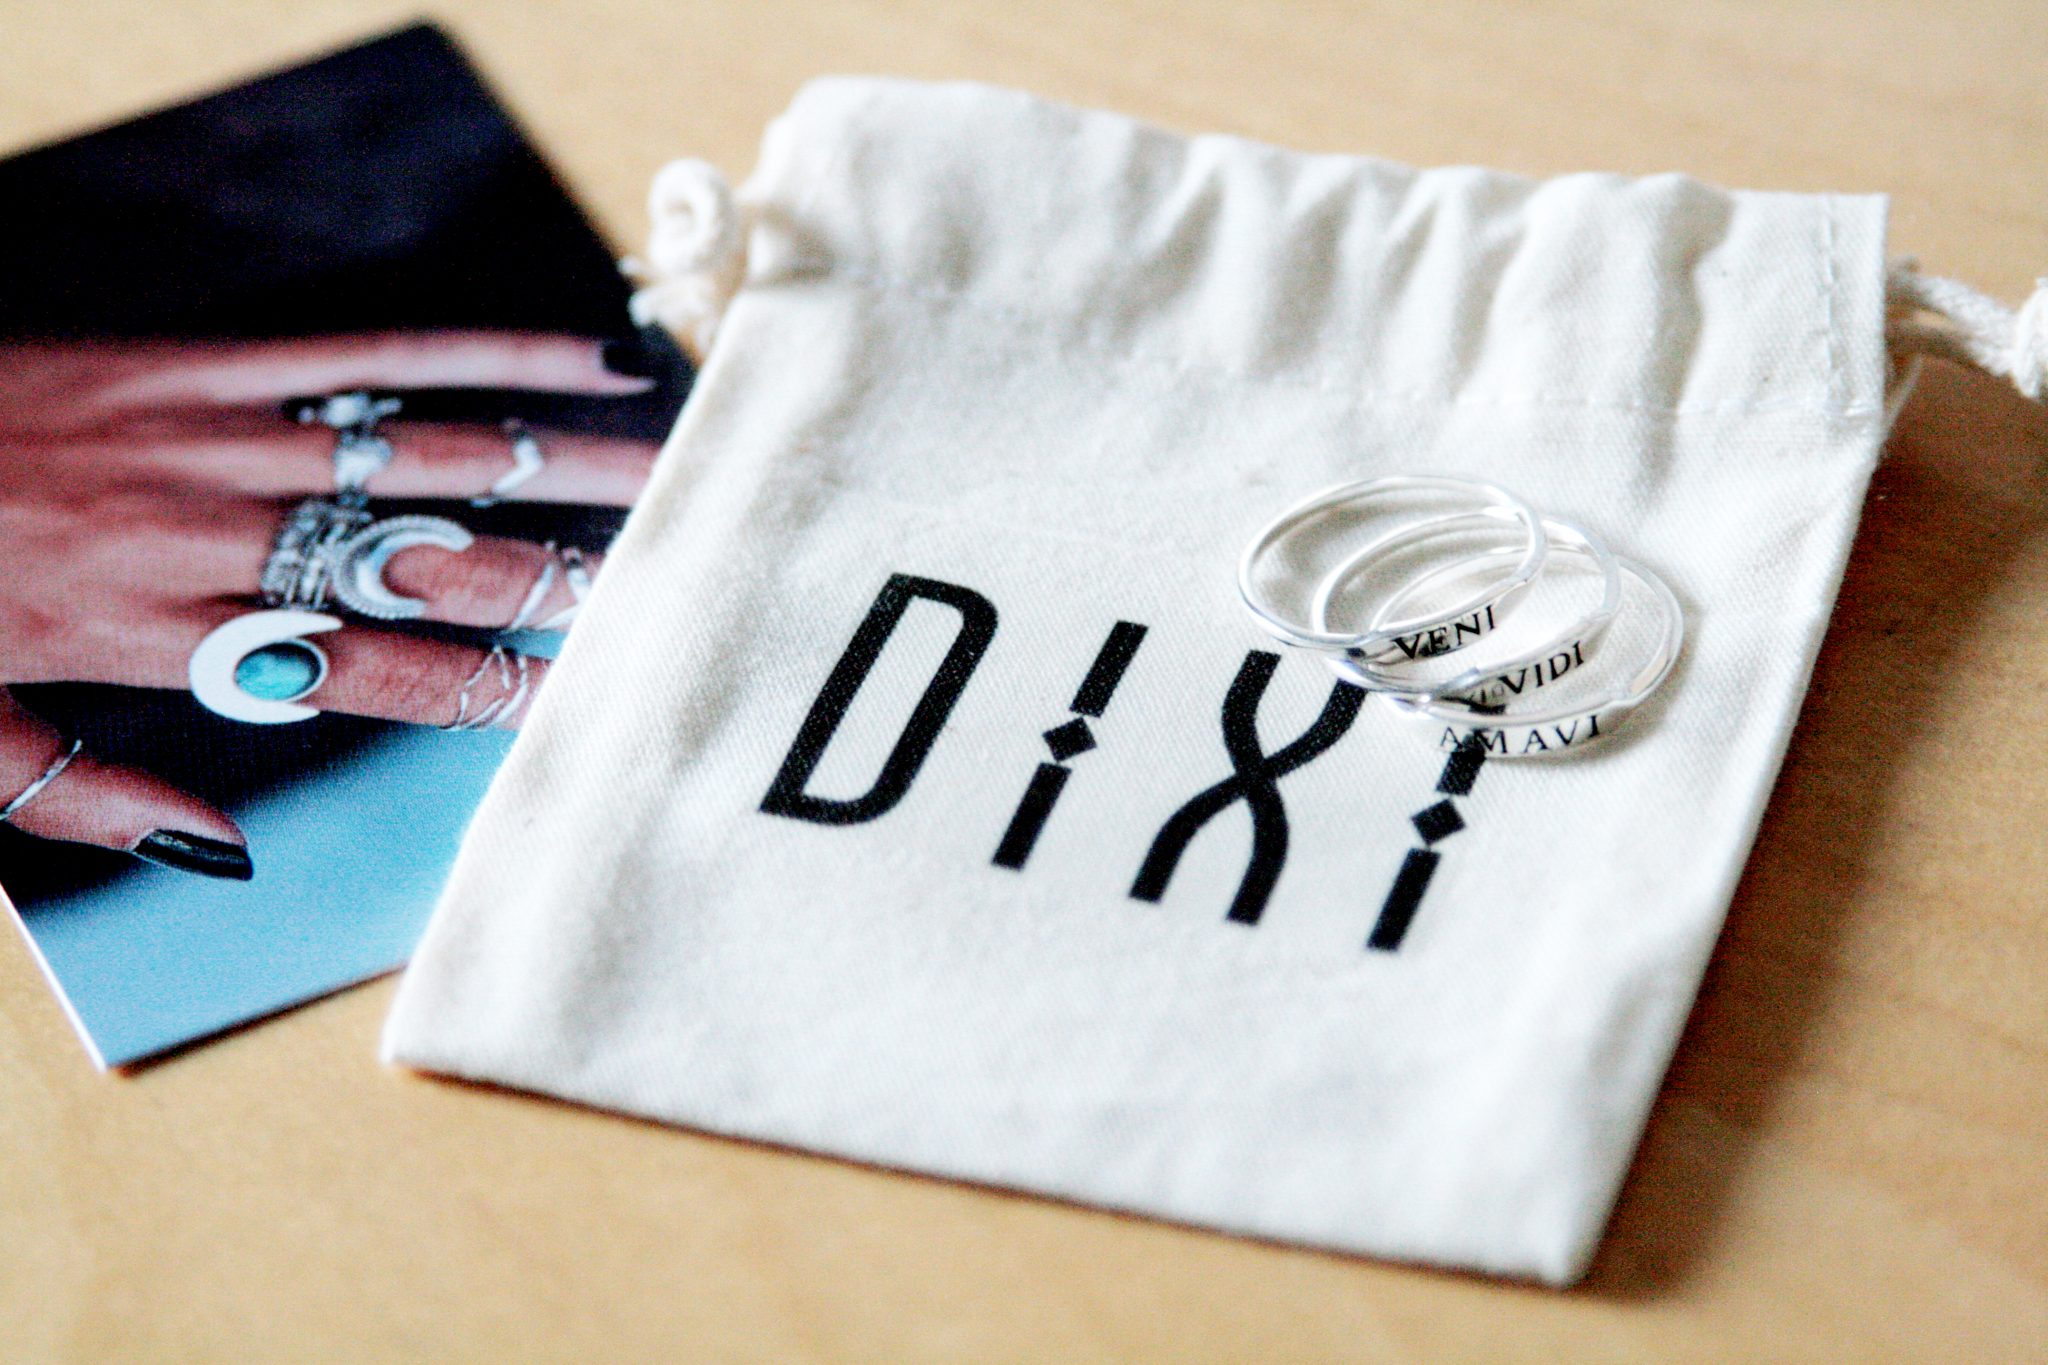 Manchester based fashion and lifestyle blogger. Dixi jewellery - silver veni vidi amavi rings.